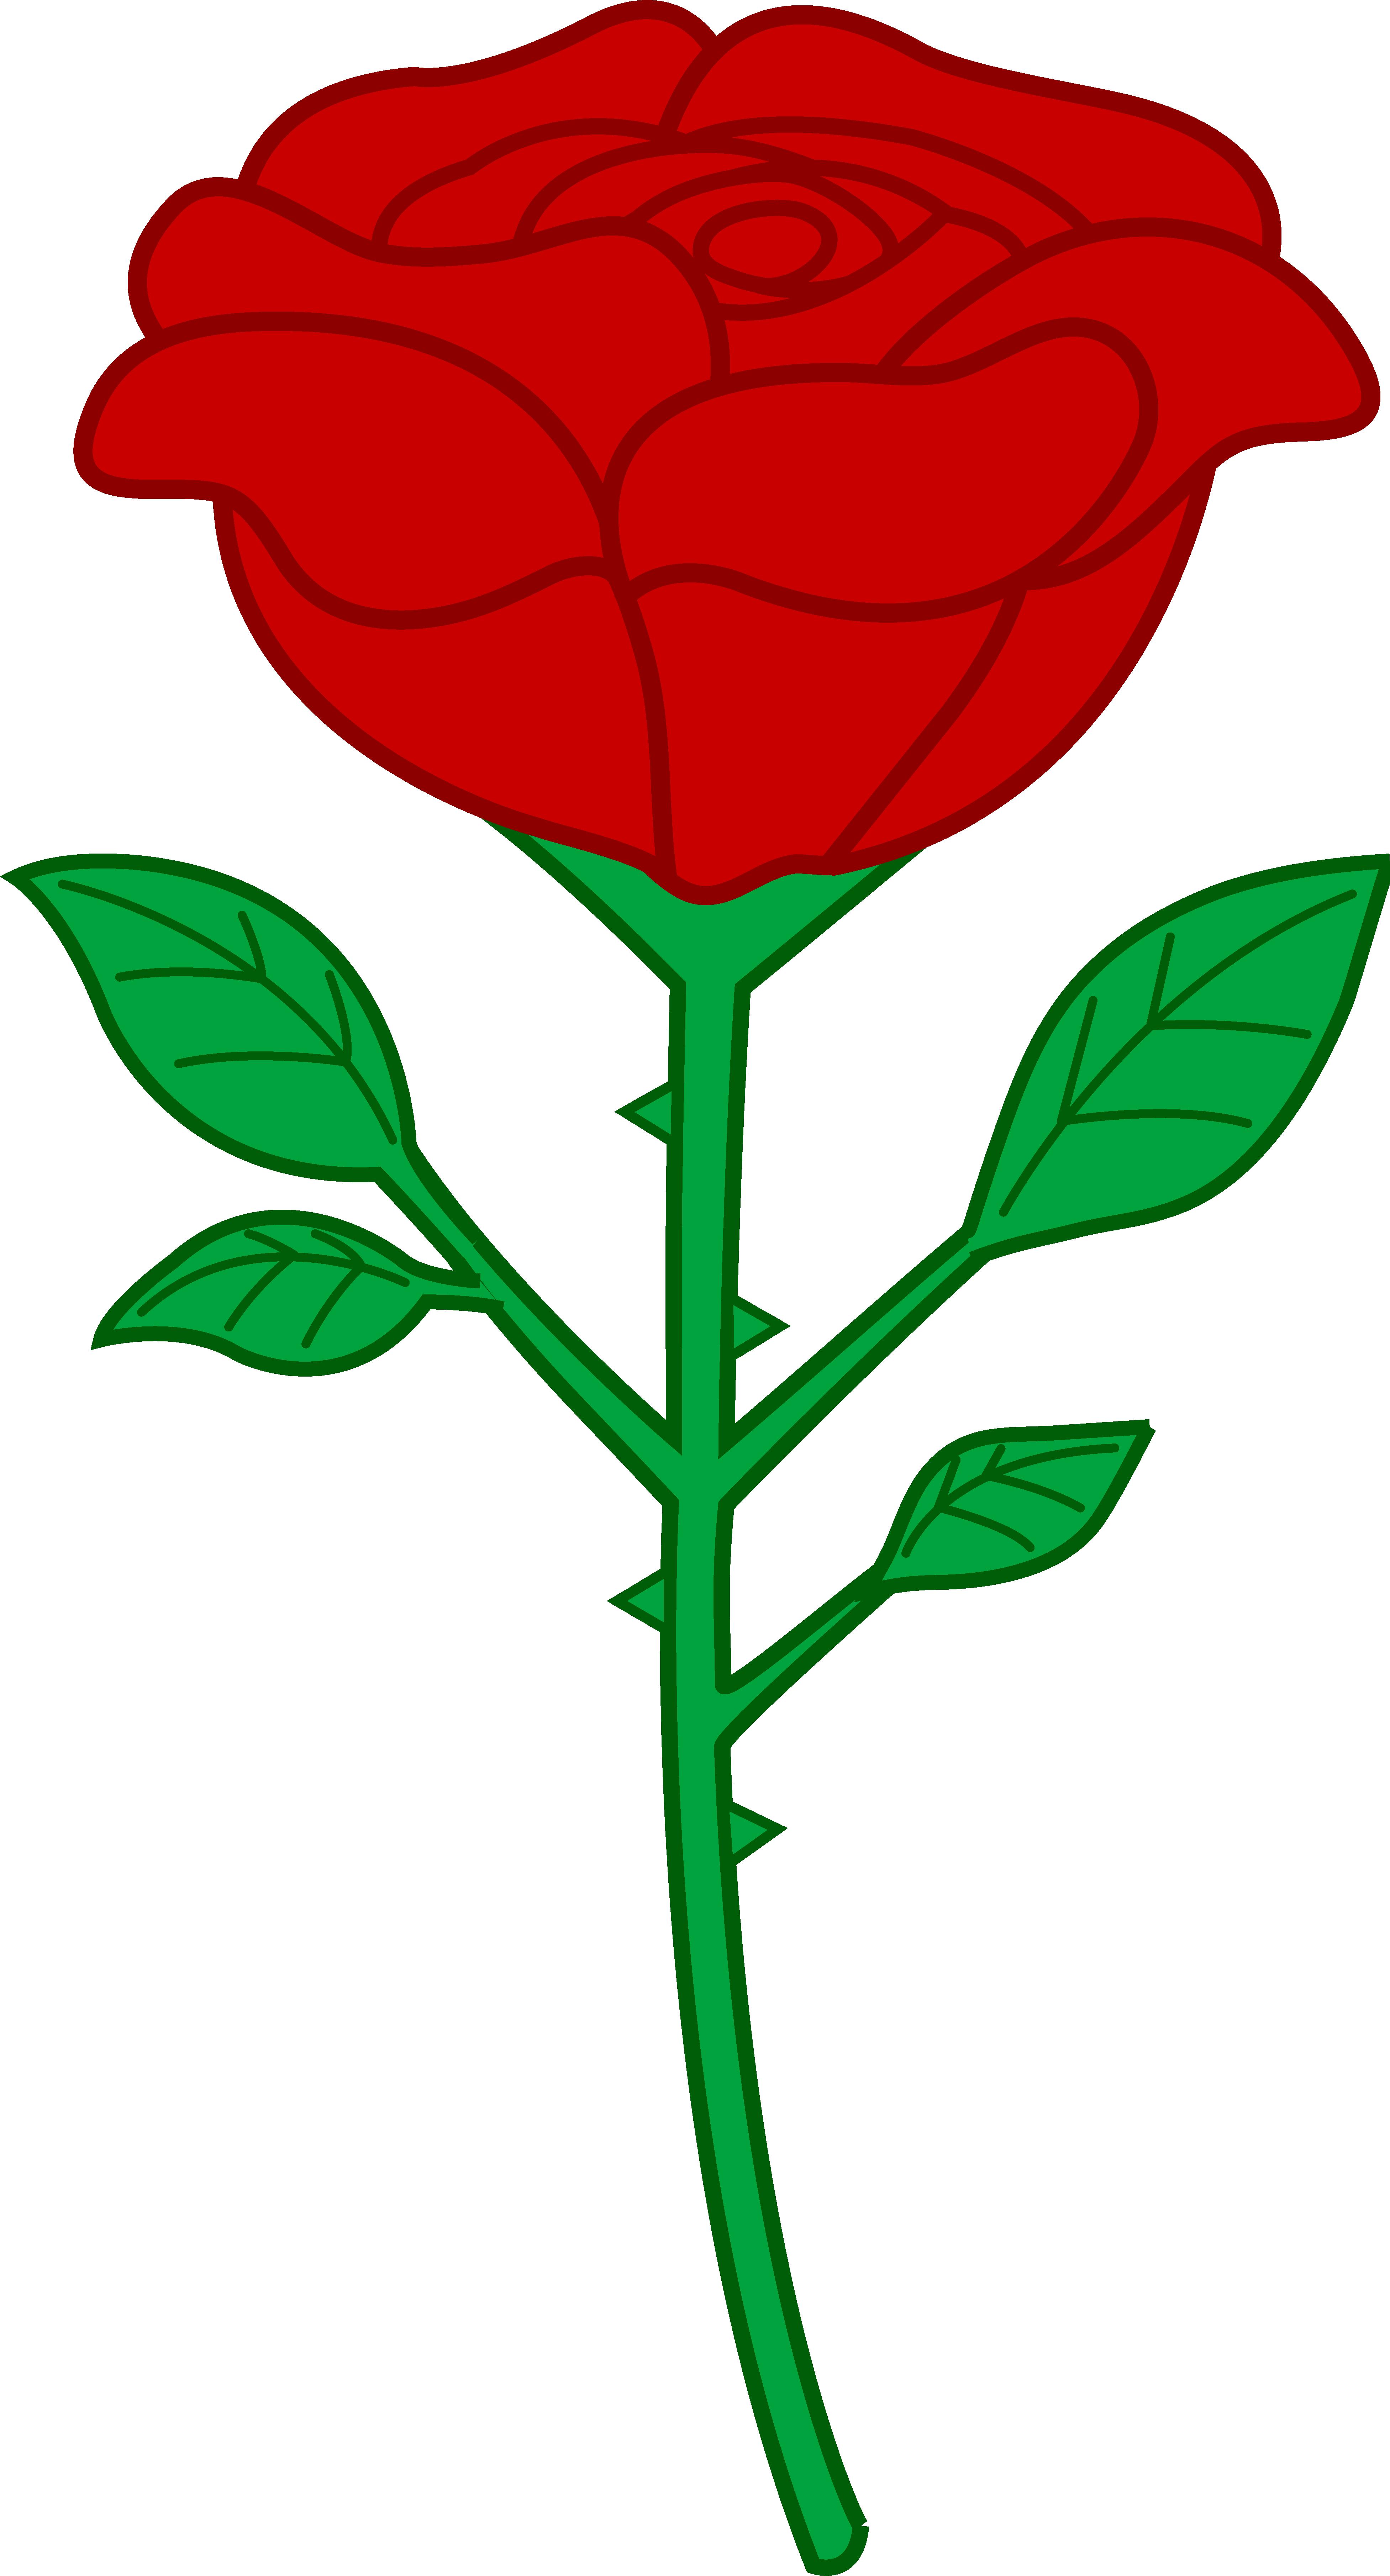 Clipart roses. Cartoon